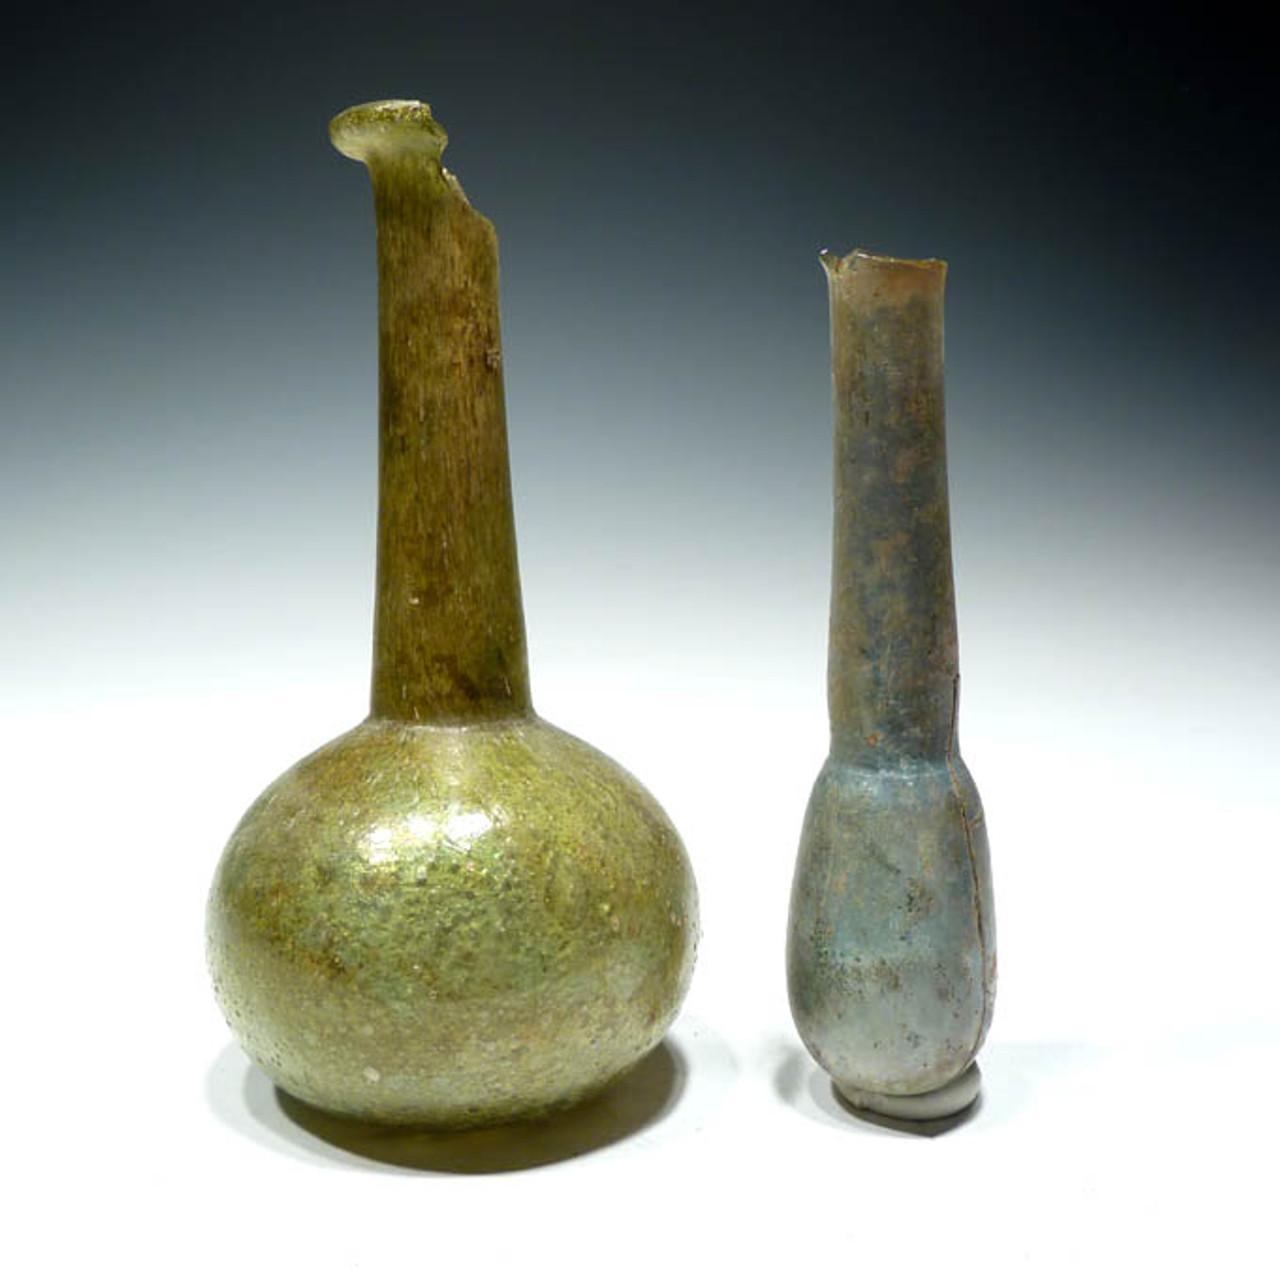 R103 - TWO COLORFUL ANCIENT ROMAN GLASS UNGUENTARIUM VIALS